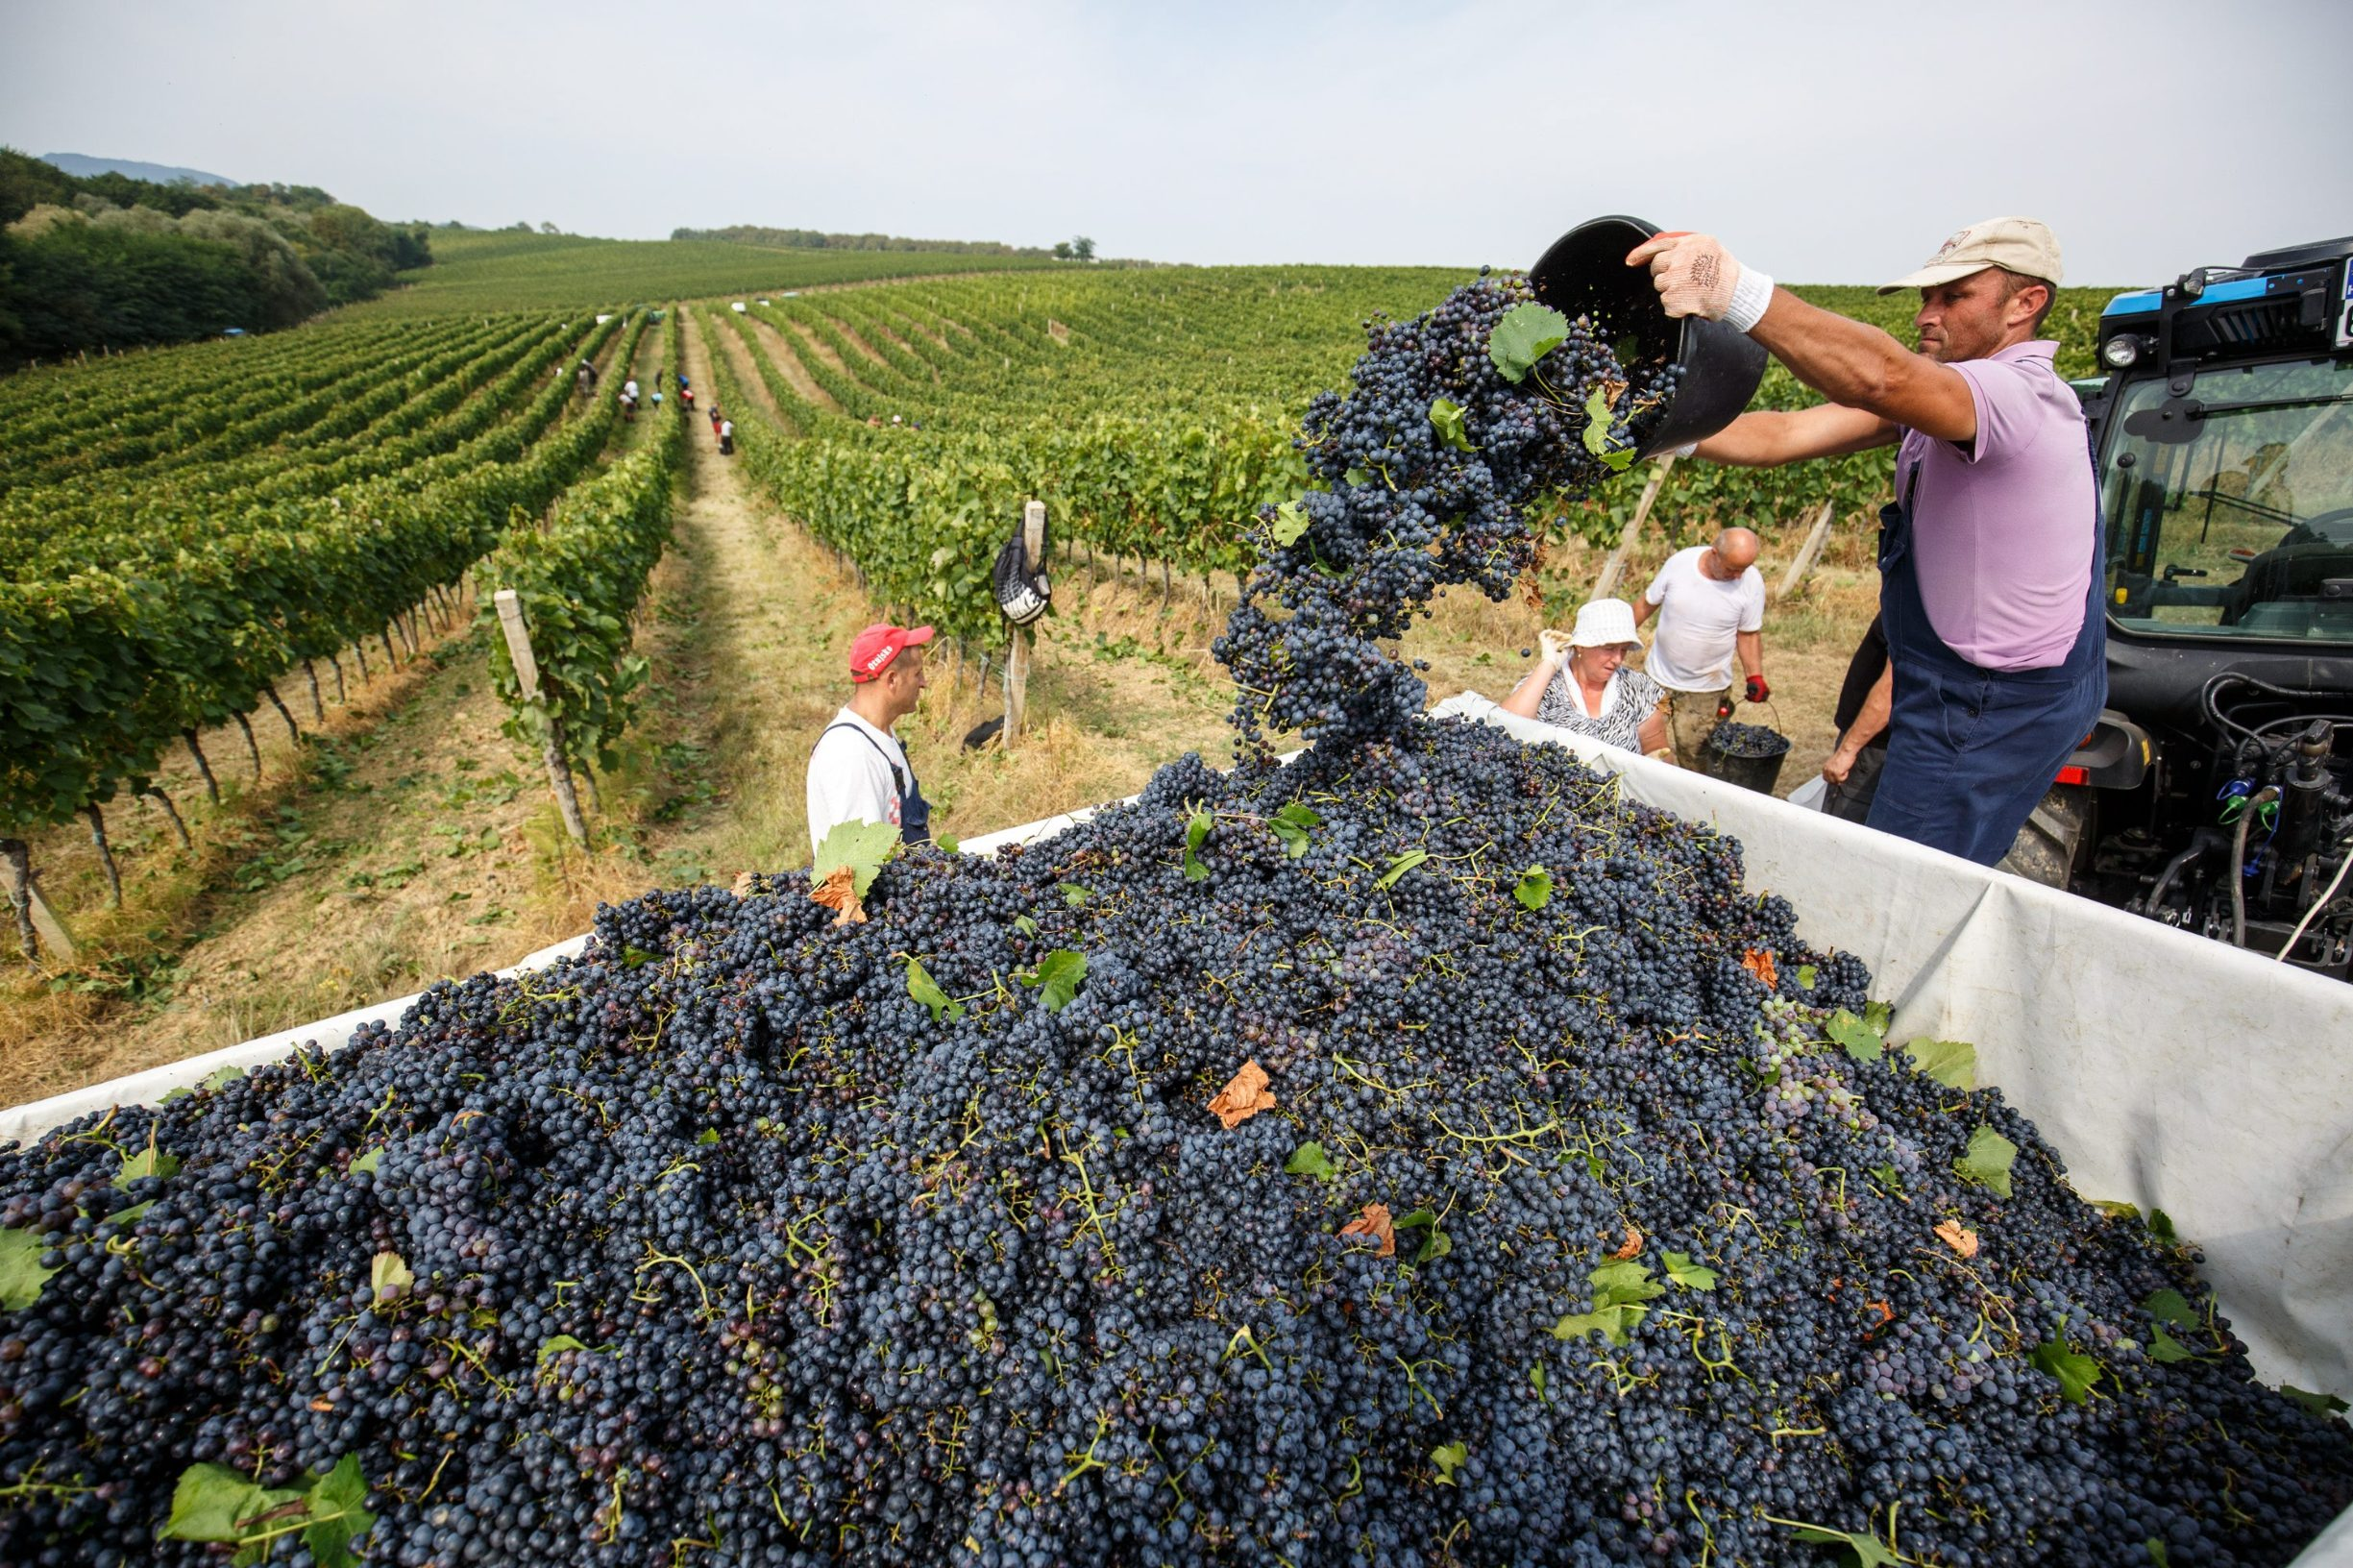 Fericanci, 290819. Reportaza s berbe grozdja u vinogradima Feravina. Foto: Vlado Kos / CROPIX